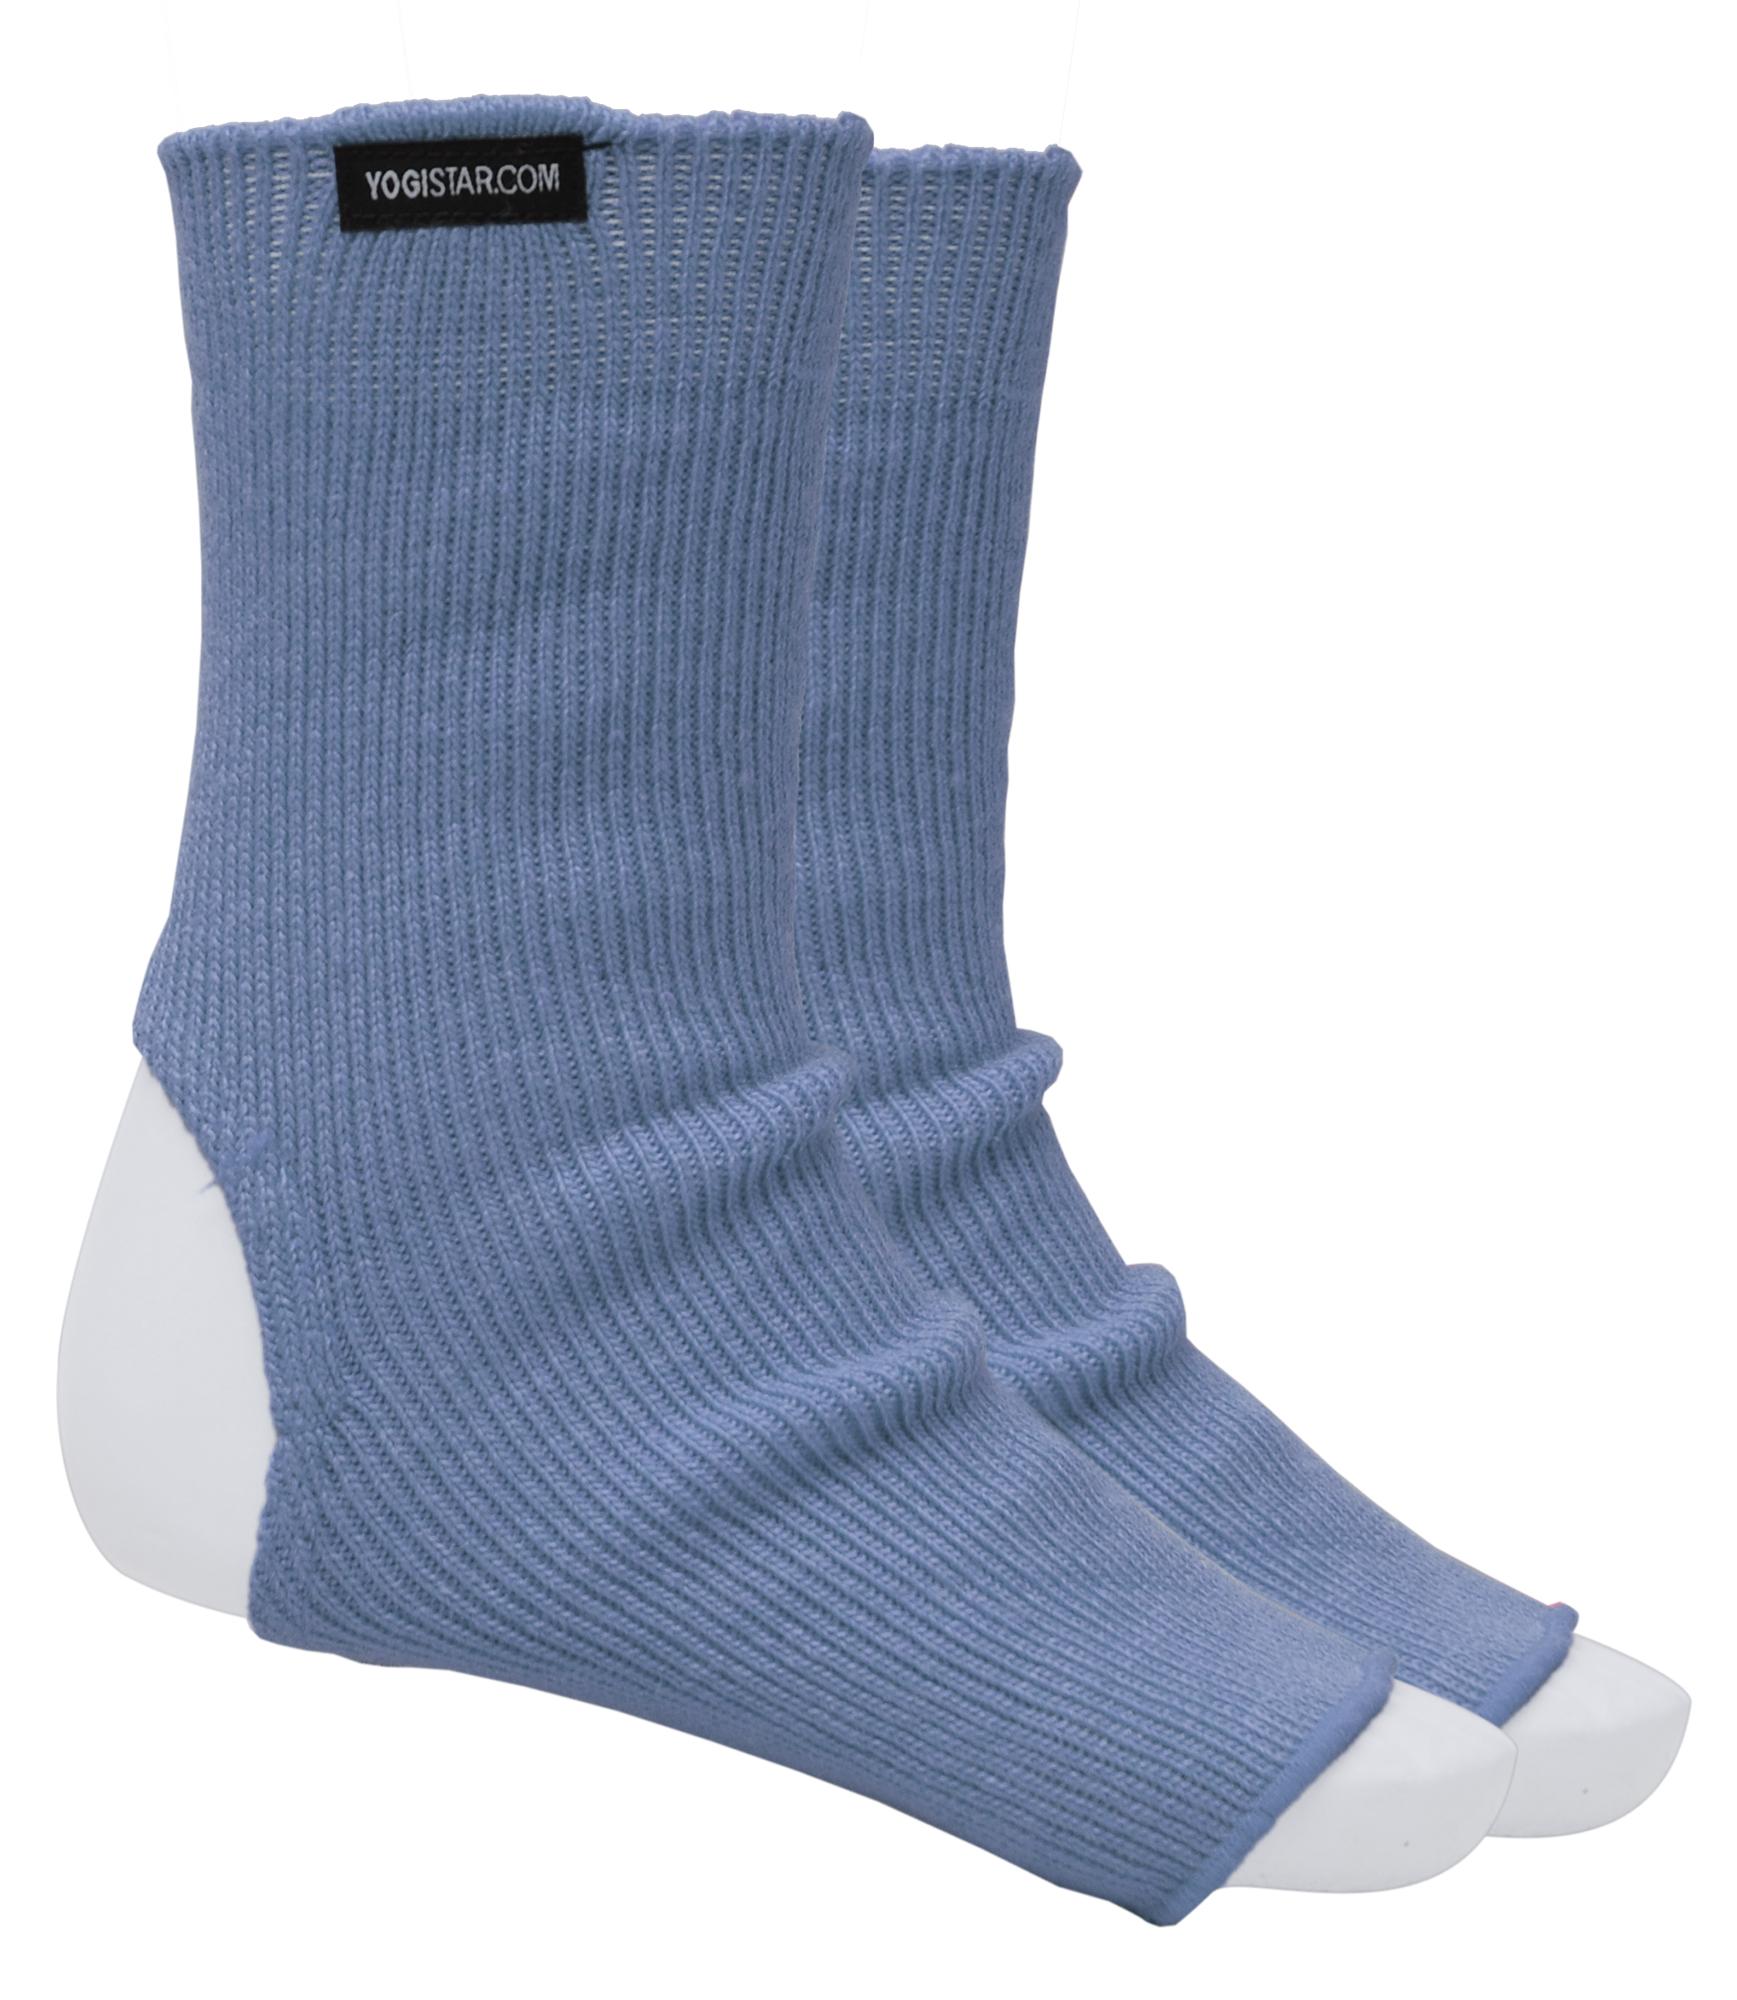 Yoga-Socken